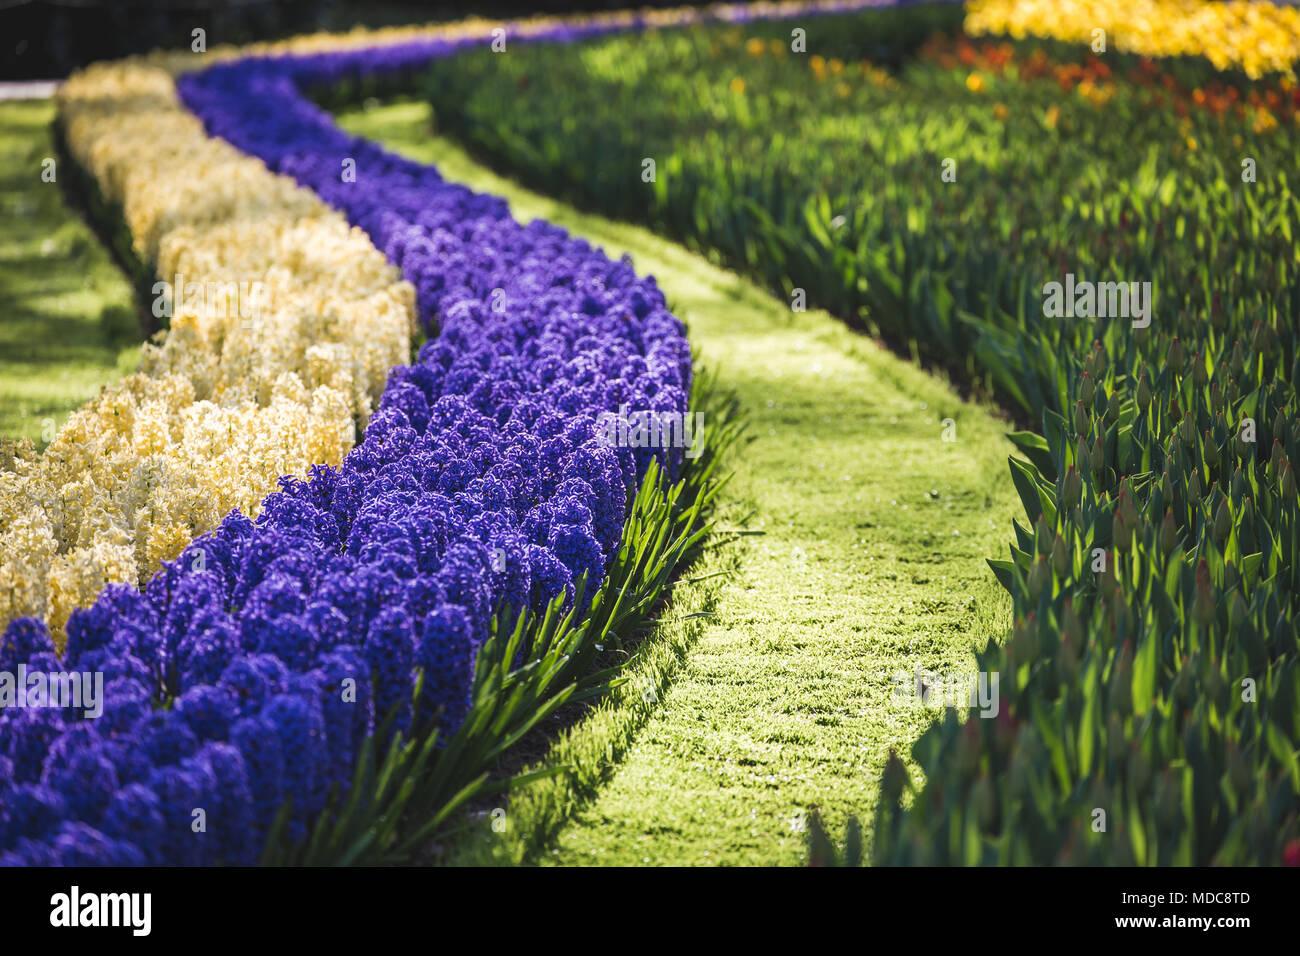 Netherlands, Lisse, Keukenhof gardens - Stock Image